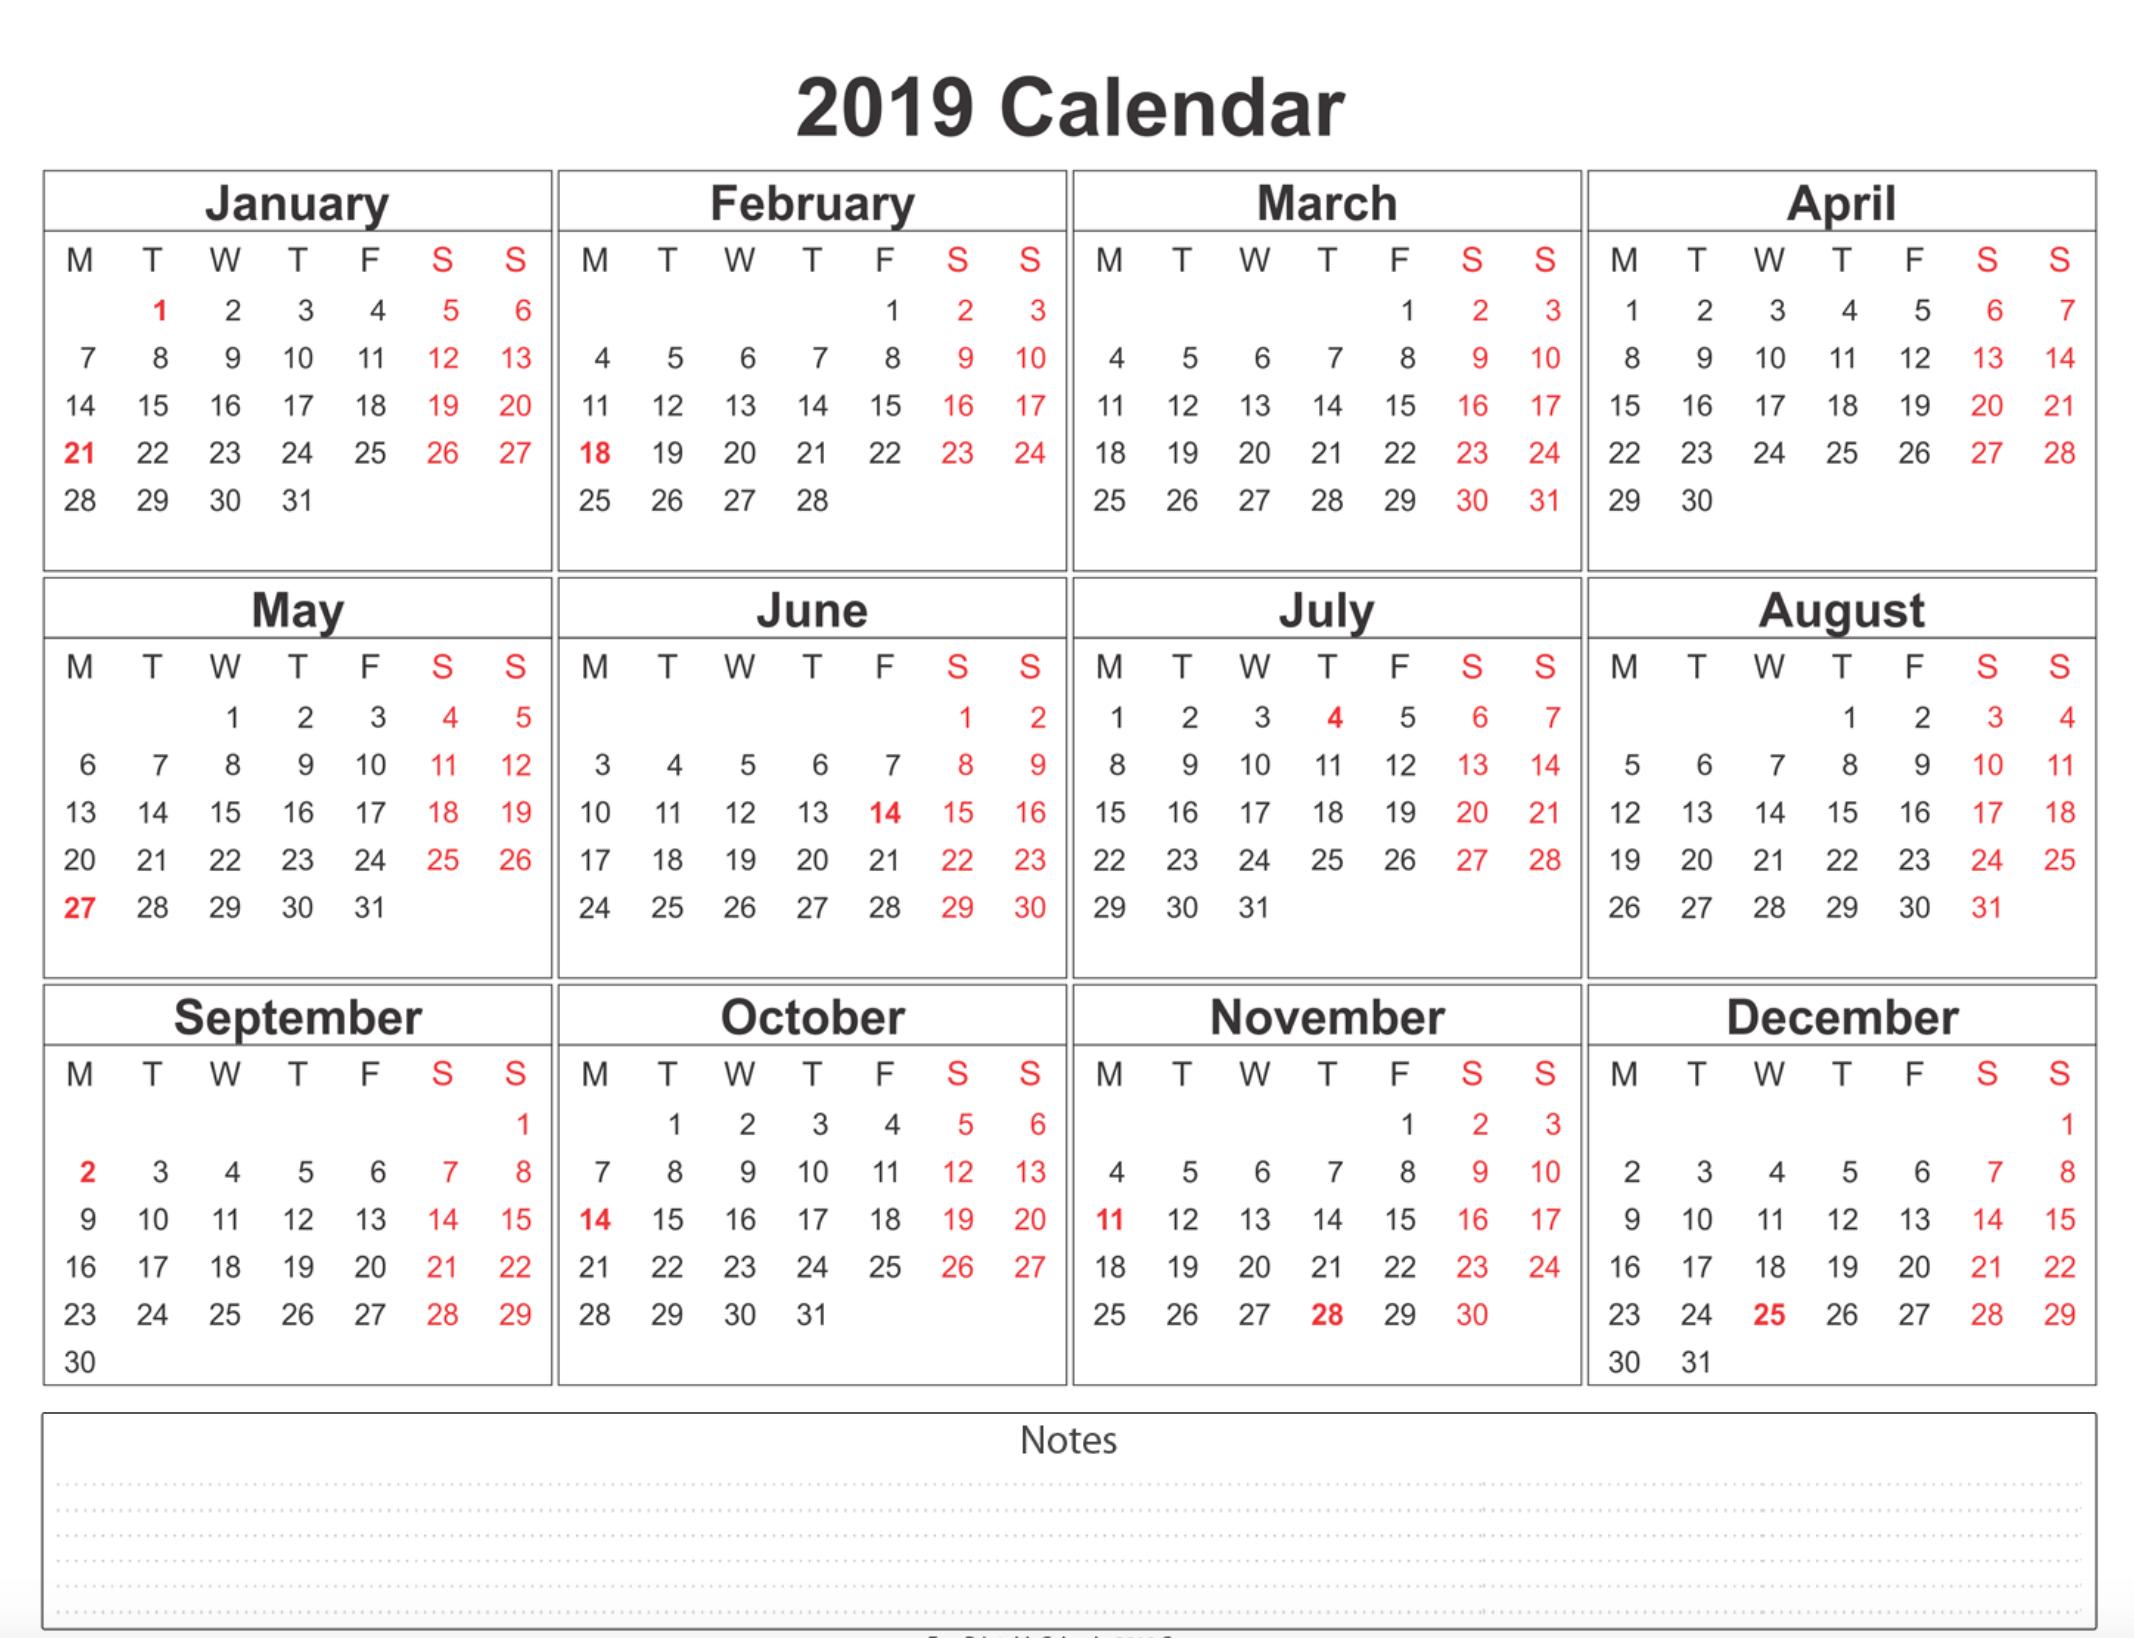 Free Blank Printable Calendar 2019 With Holidays Template